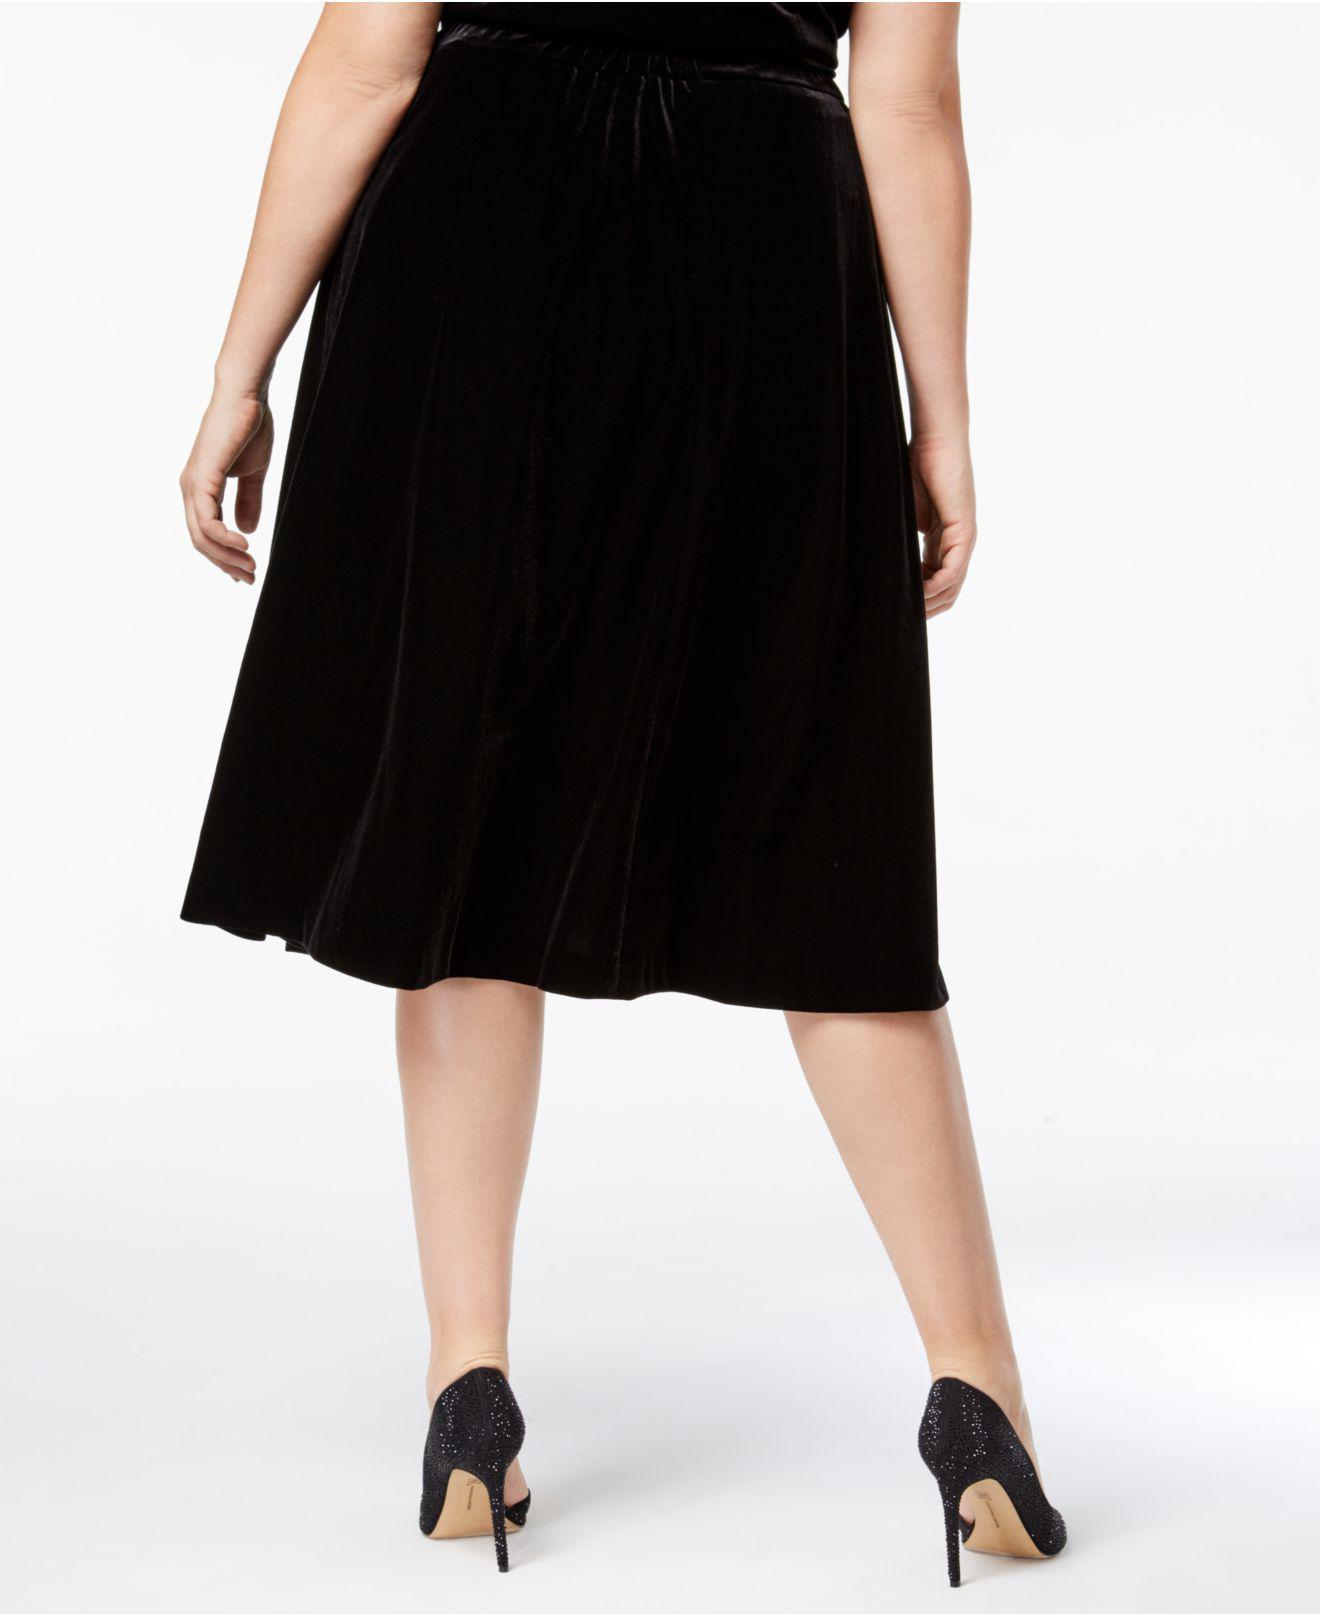 bb92297a5ee4e Lyst - Alex Evenings Plus Size Velvet A-line Skirt in Black